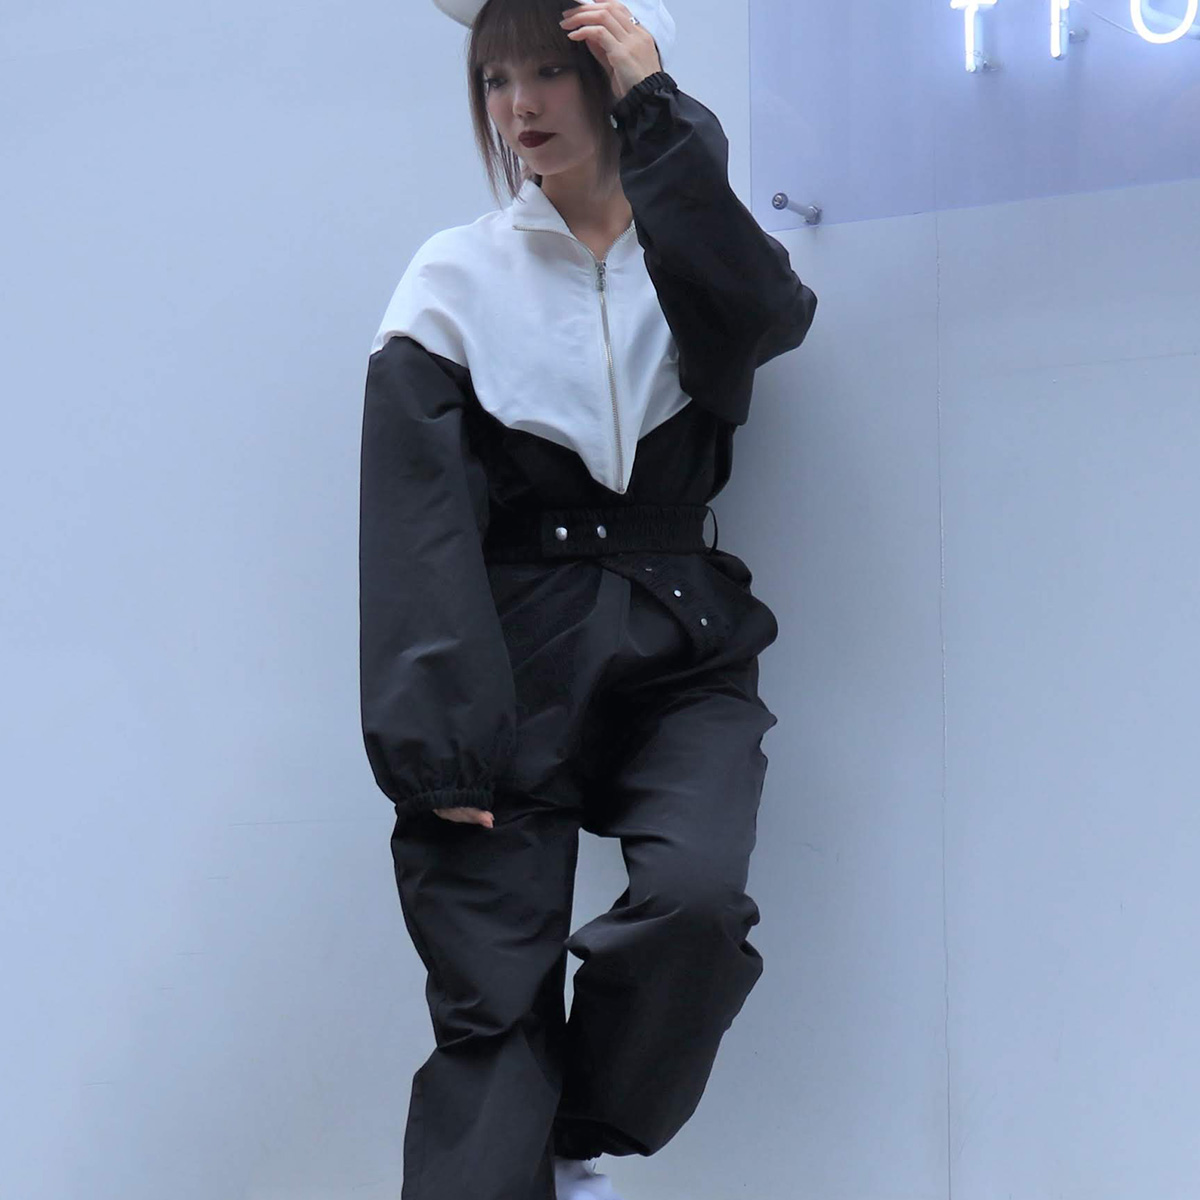 atmos pink 切替コンビネゾン(アトモスピンク キリカエコンビネゾン)BLACK【レディース パンツ】19FA-I